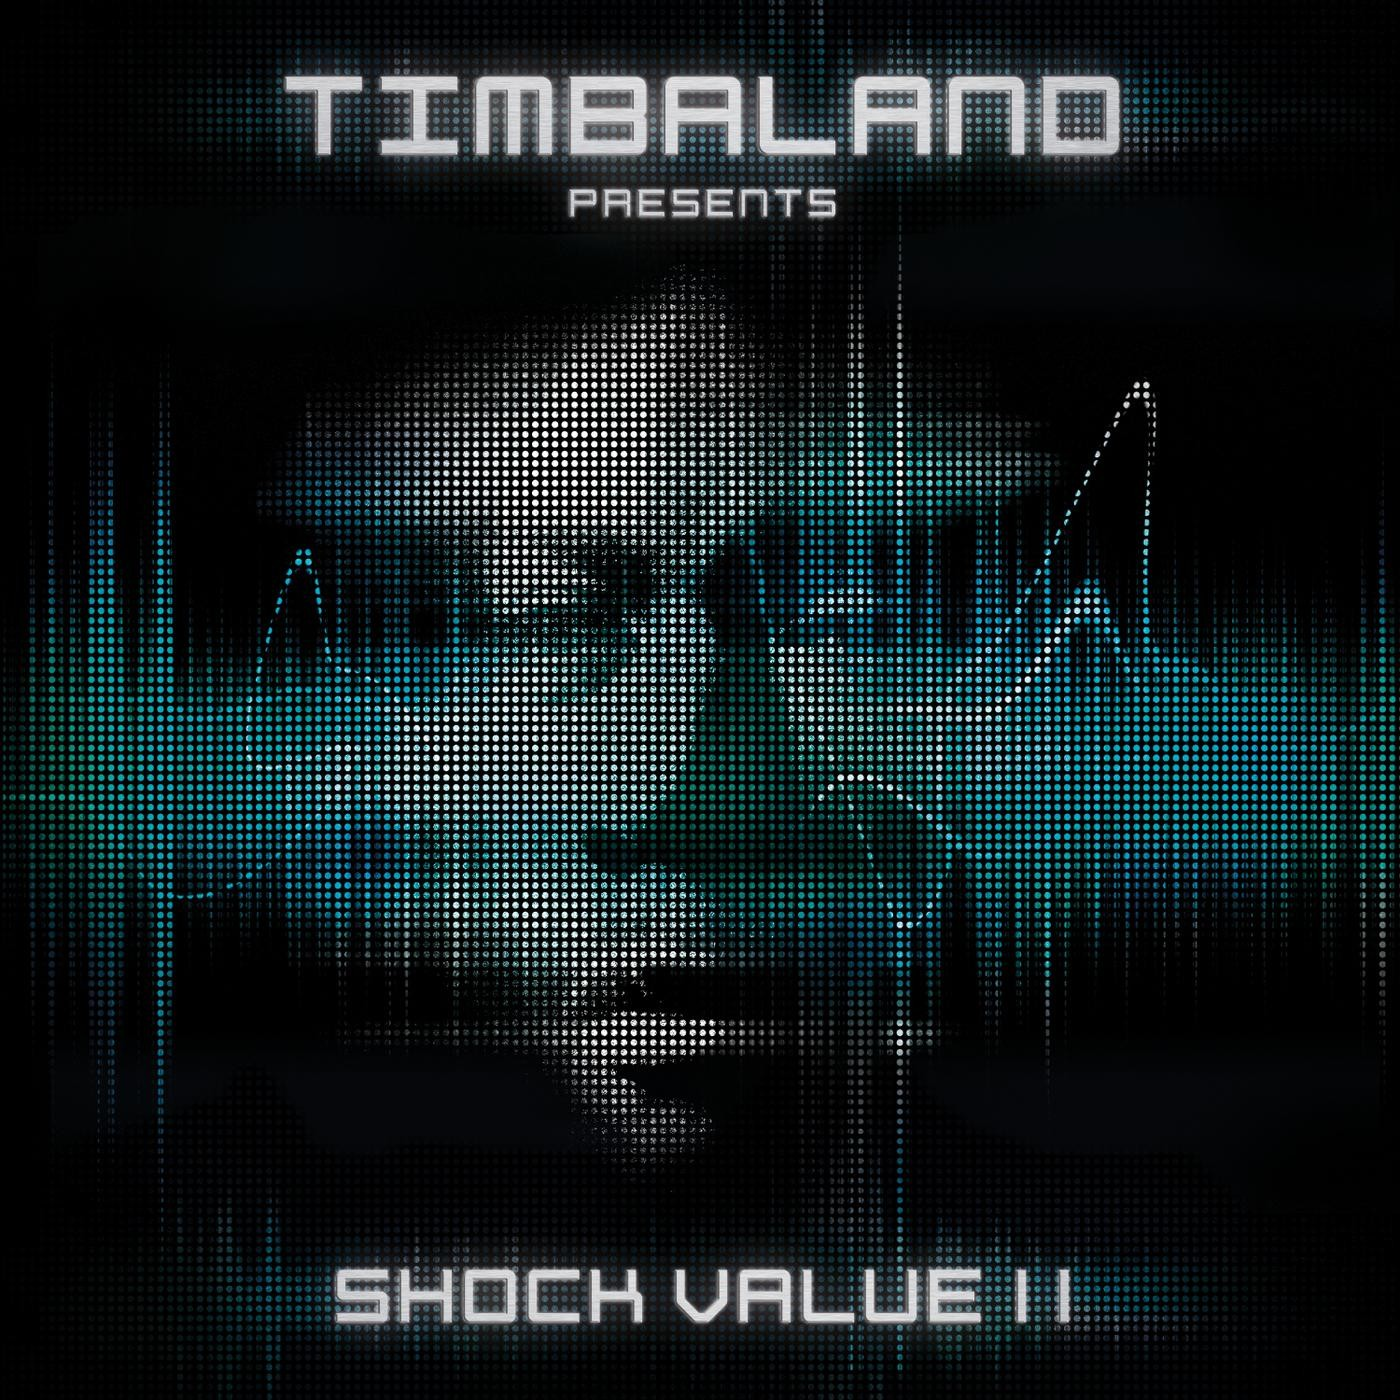 http://4.bp.blogspot.com/_bI5-8YnkkFA/SxPQoIsaNnI/AAAAAAAABzY/oTBeJanS-vM/s1600/00-timbaland-presents_shock_value_2-2009-front.jpg